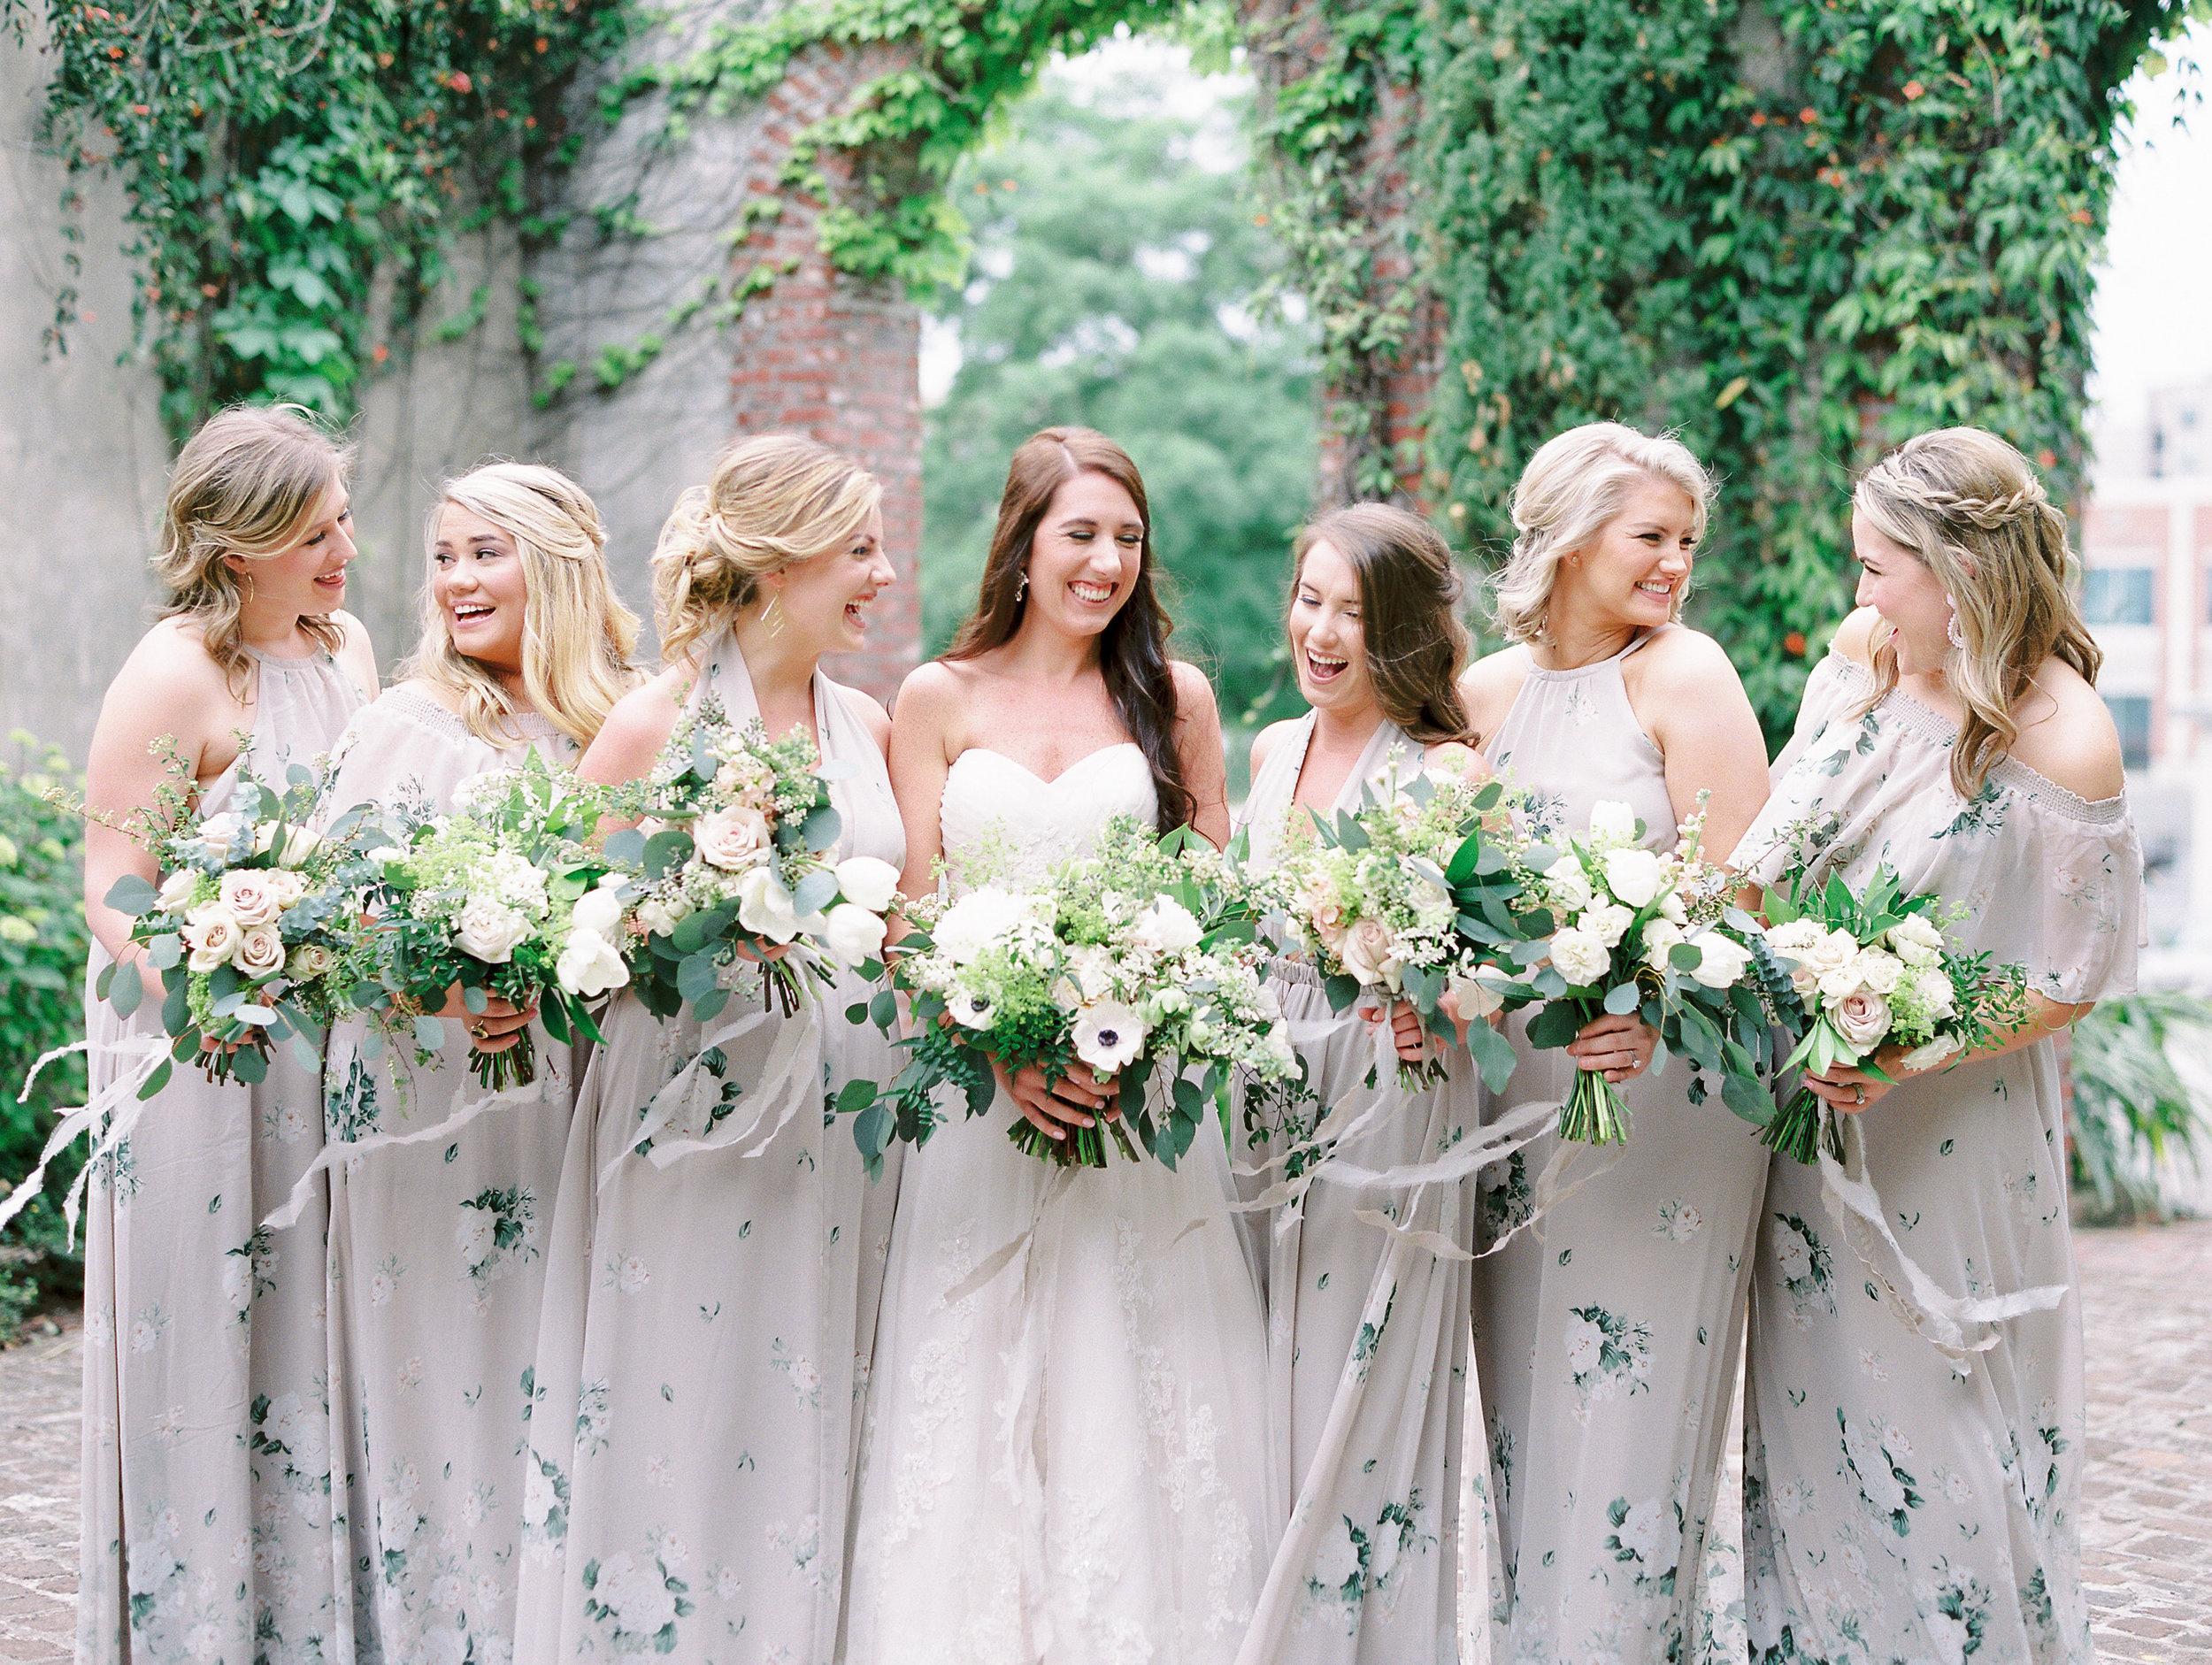 Romantic-Summerour-studio-wedding-hannah-forsberg-atlanta-wedding-photographer28.JPG